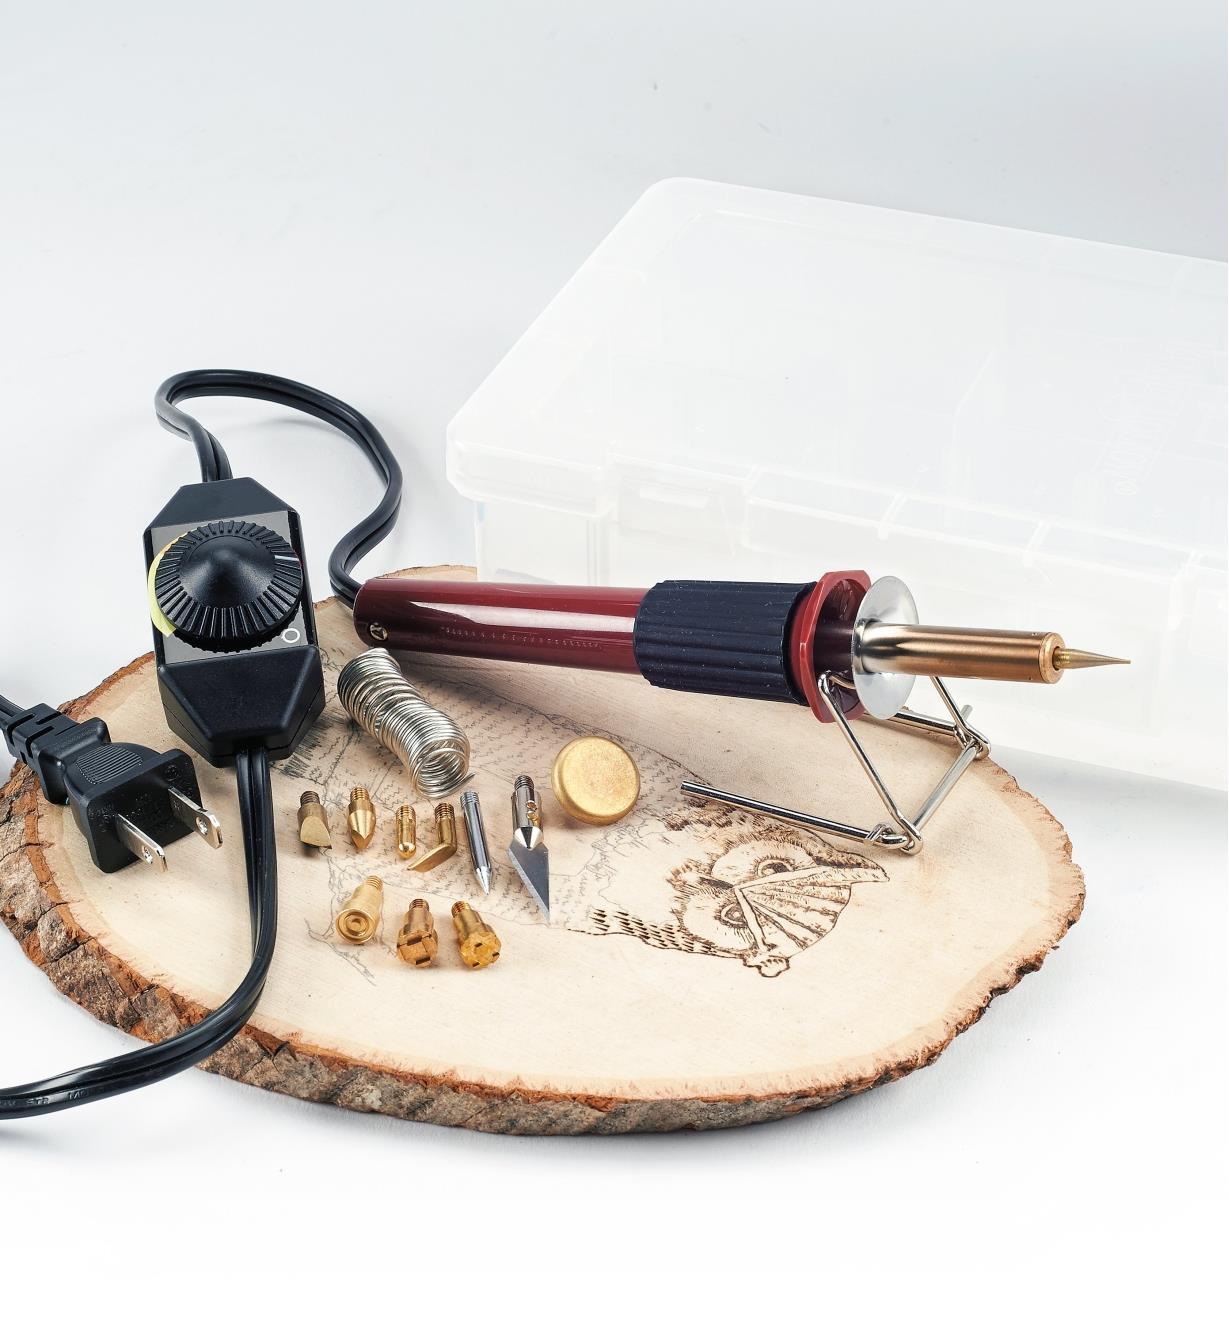 17J1802 - Fer à pyrograver multifonction